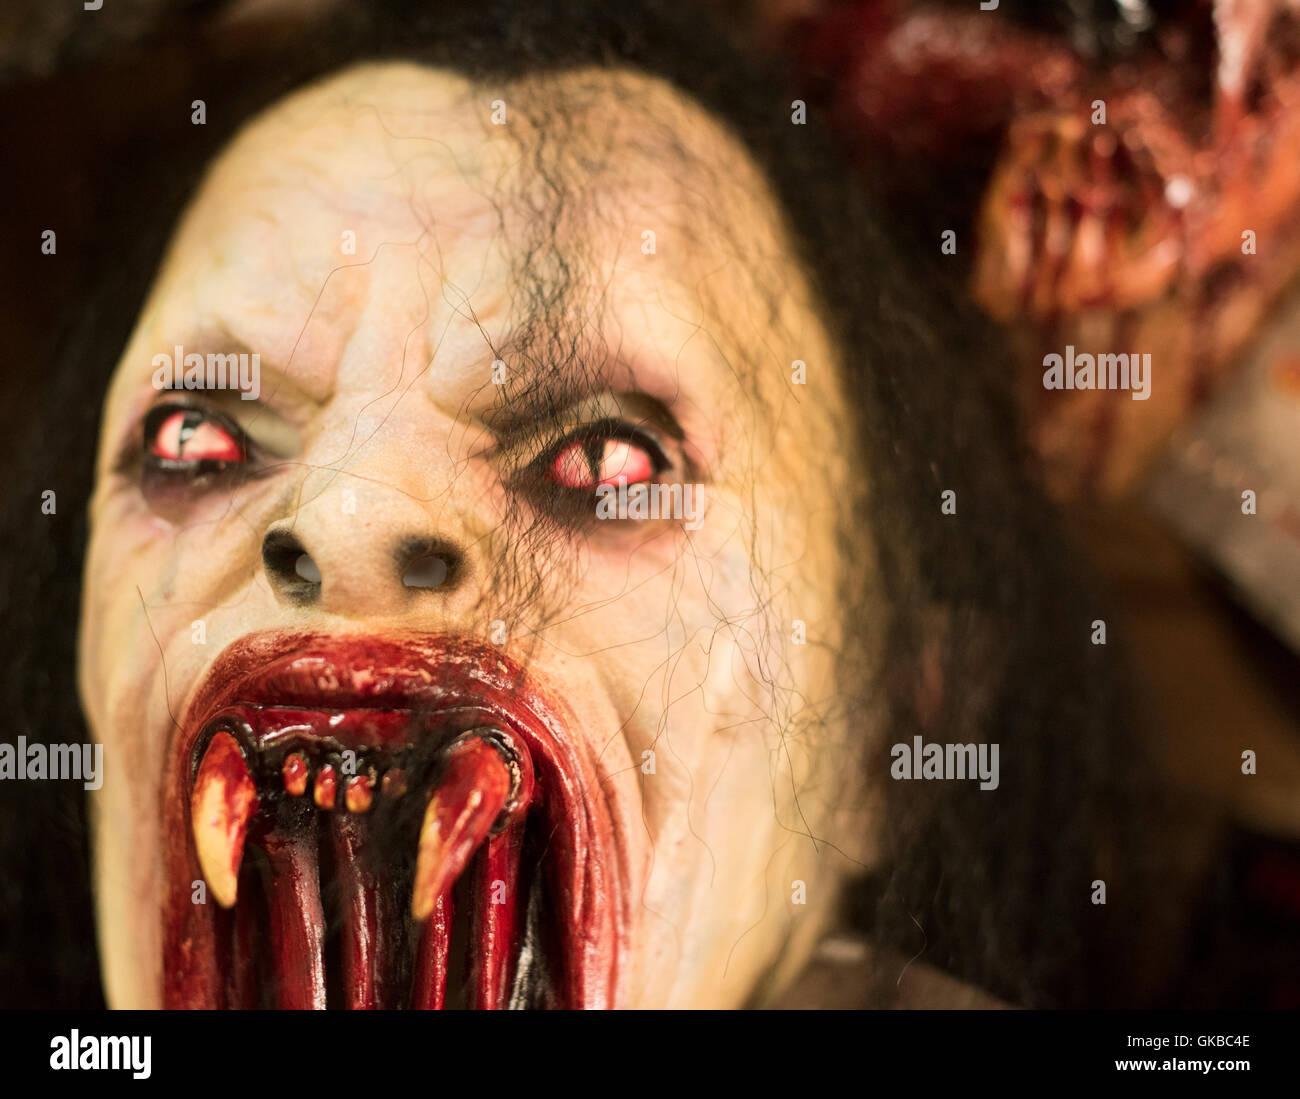 Halloween Bloody Dracula mask - Stock Image